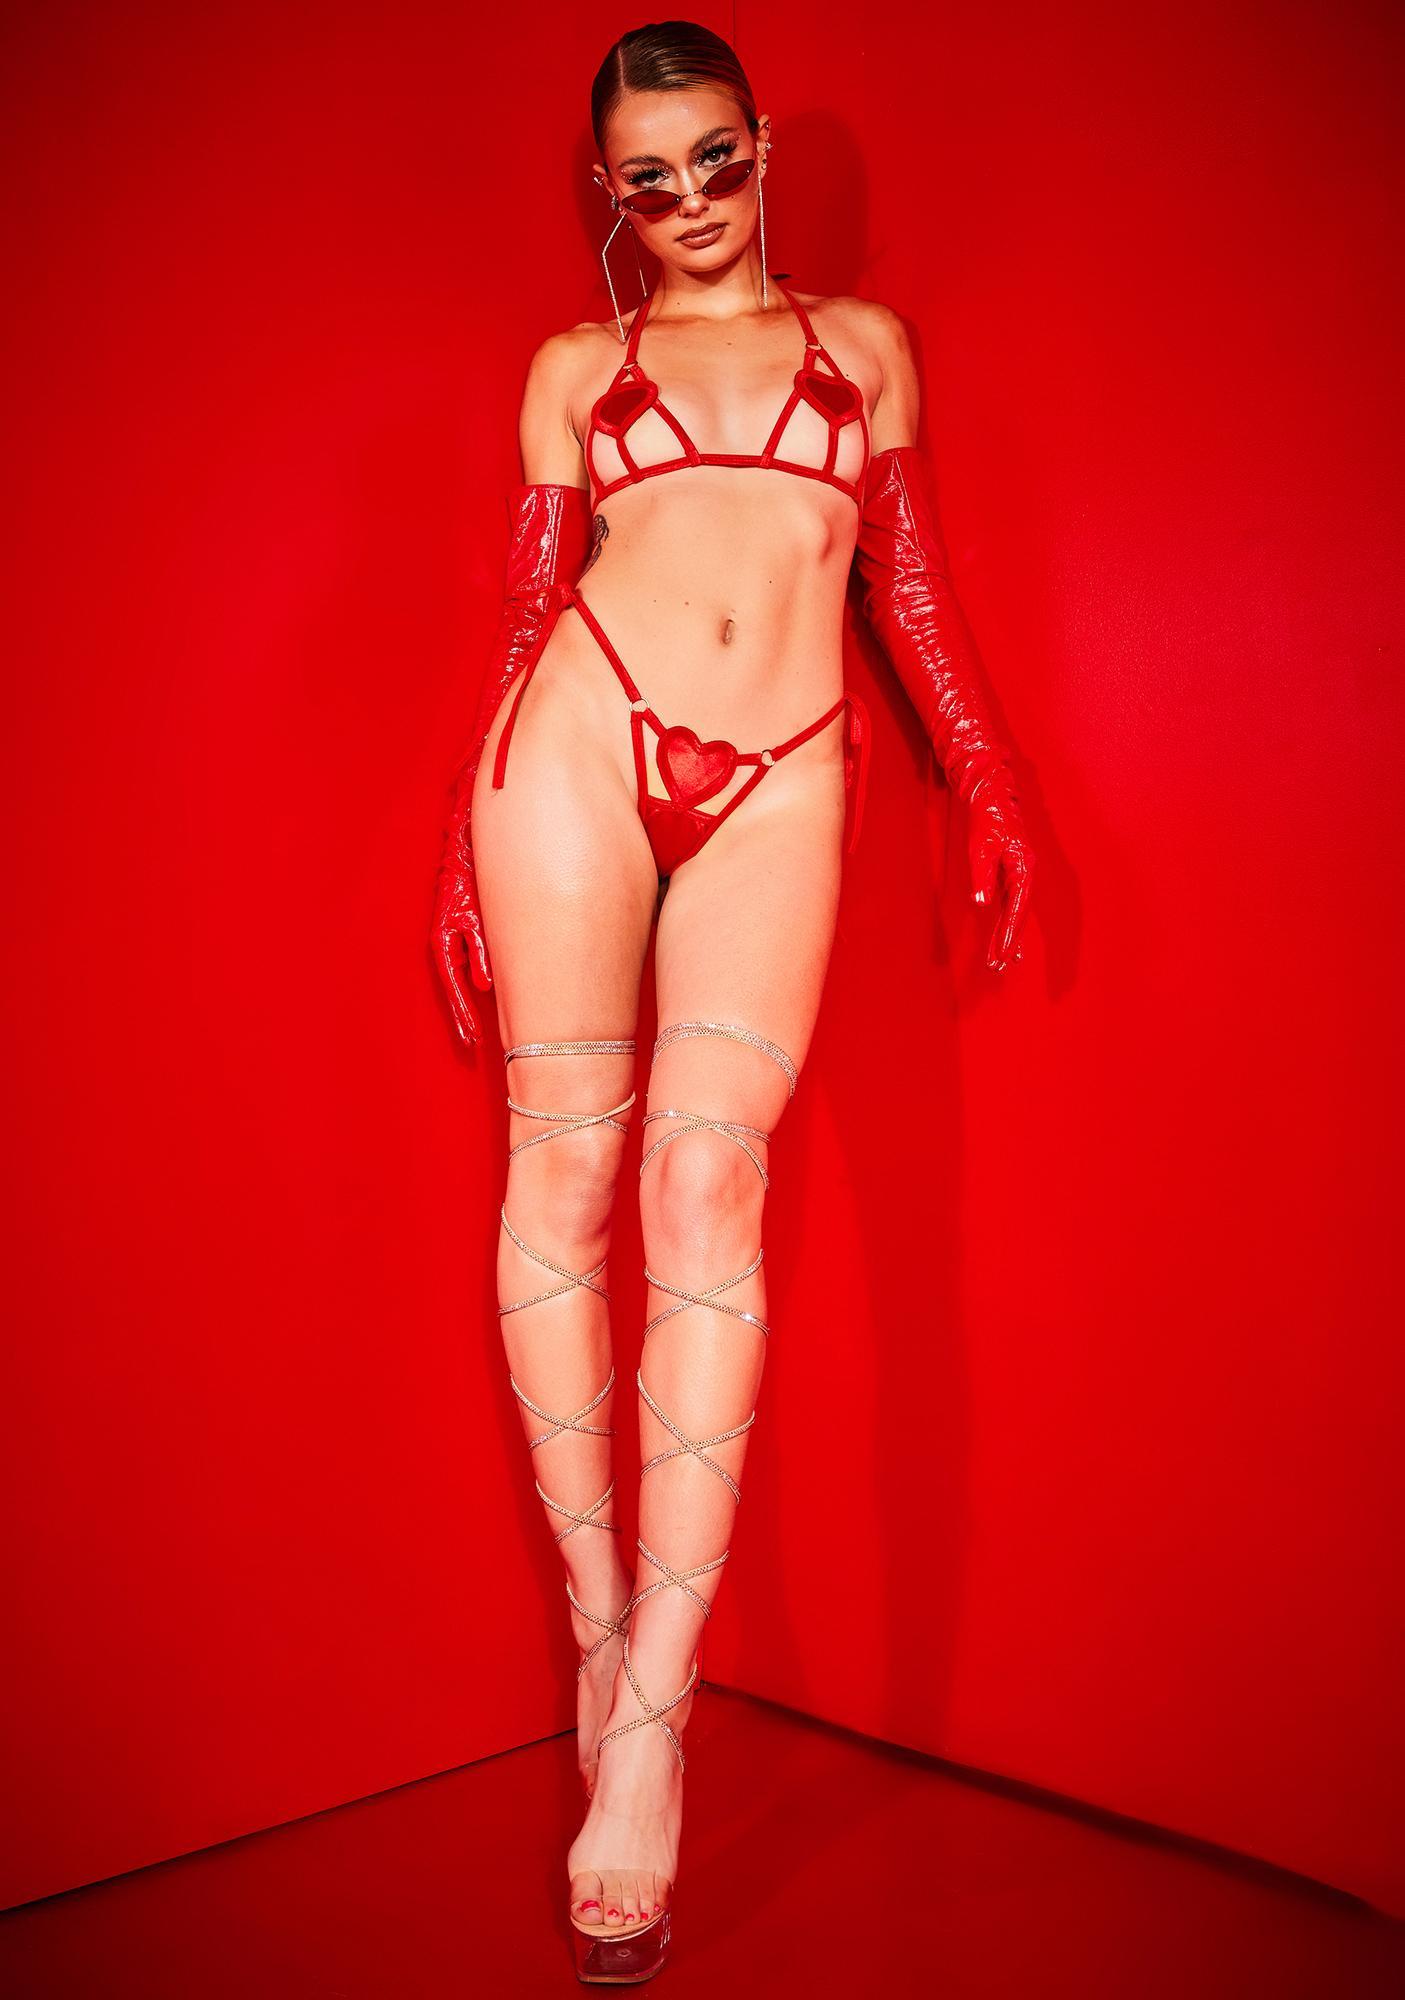 Poster Grl Scarlet Professional Heartbreaker Lingerie Set